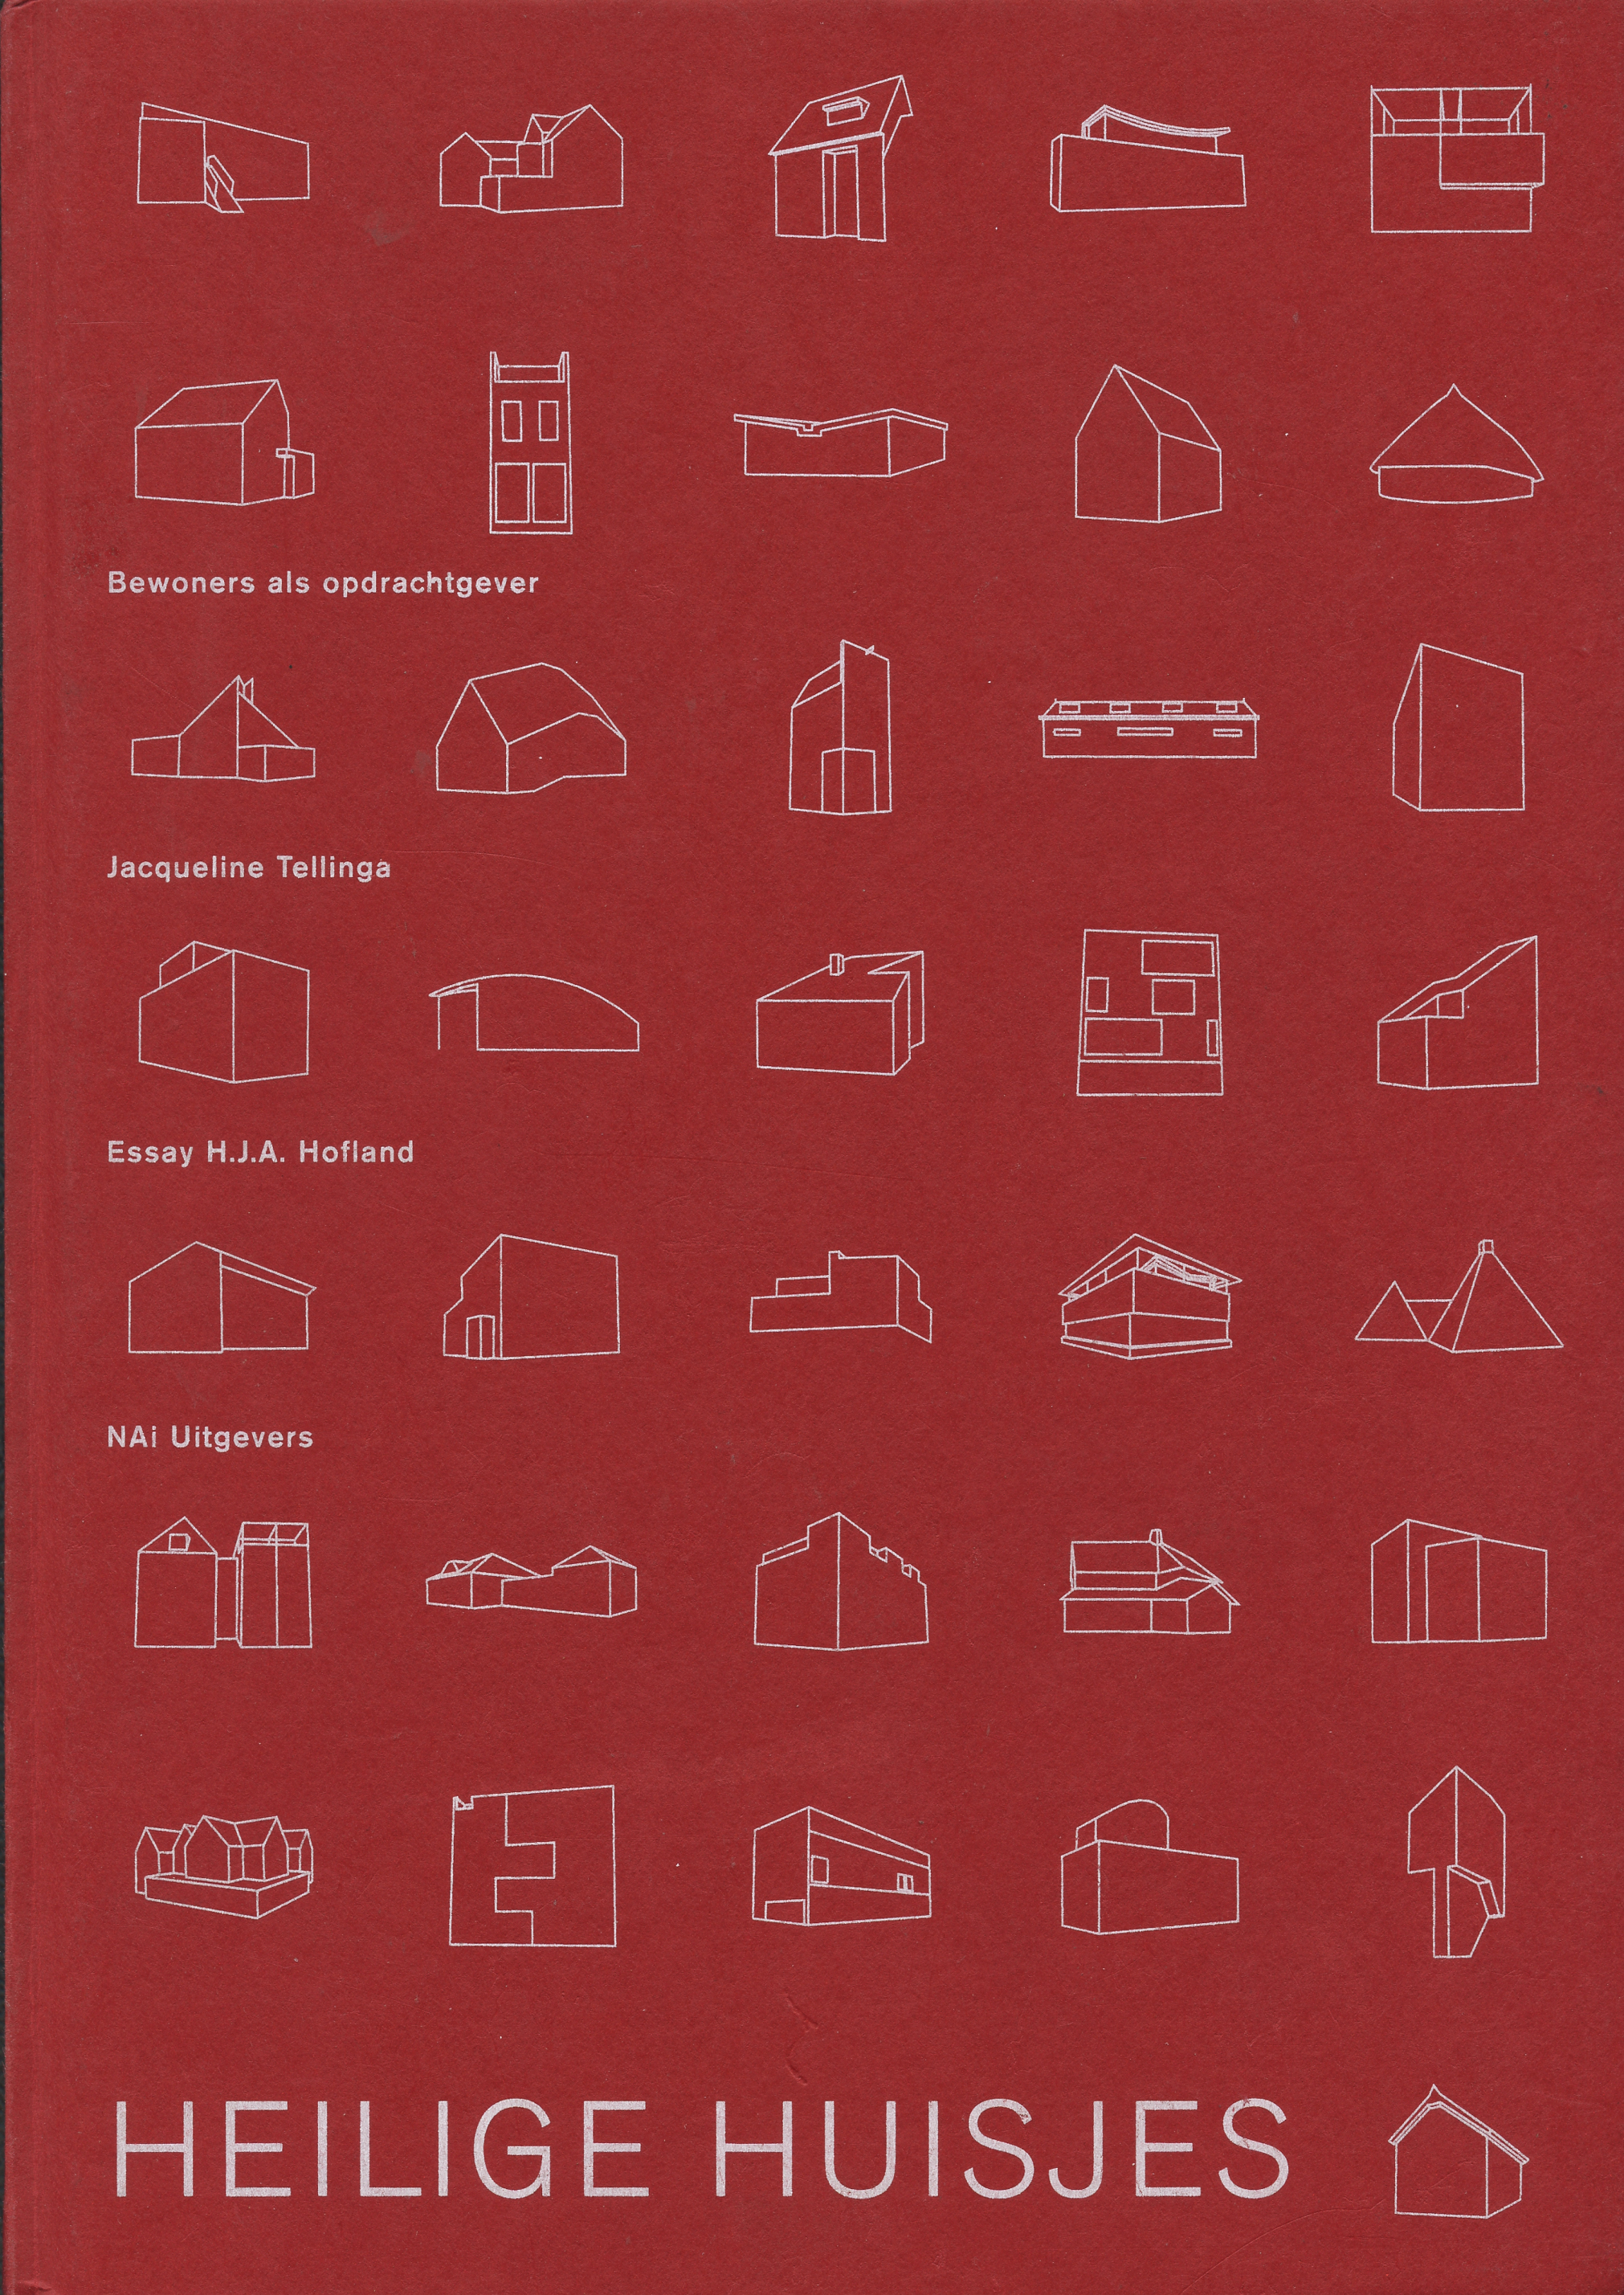 2001 Heilige huisjes, Uitgever NAi Nederlands architectuur instituut